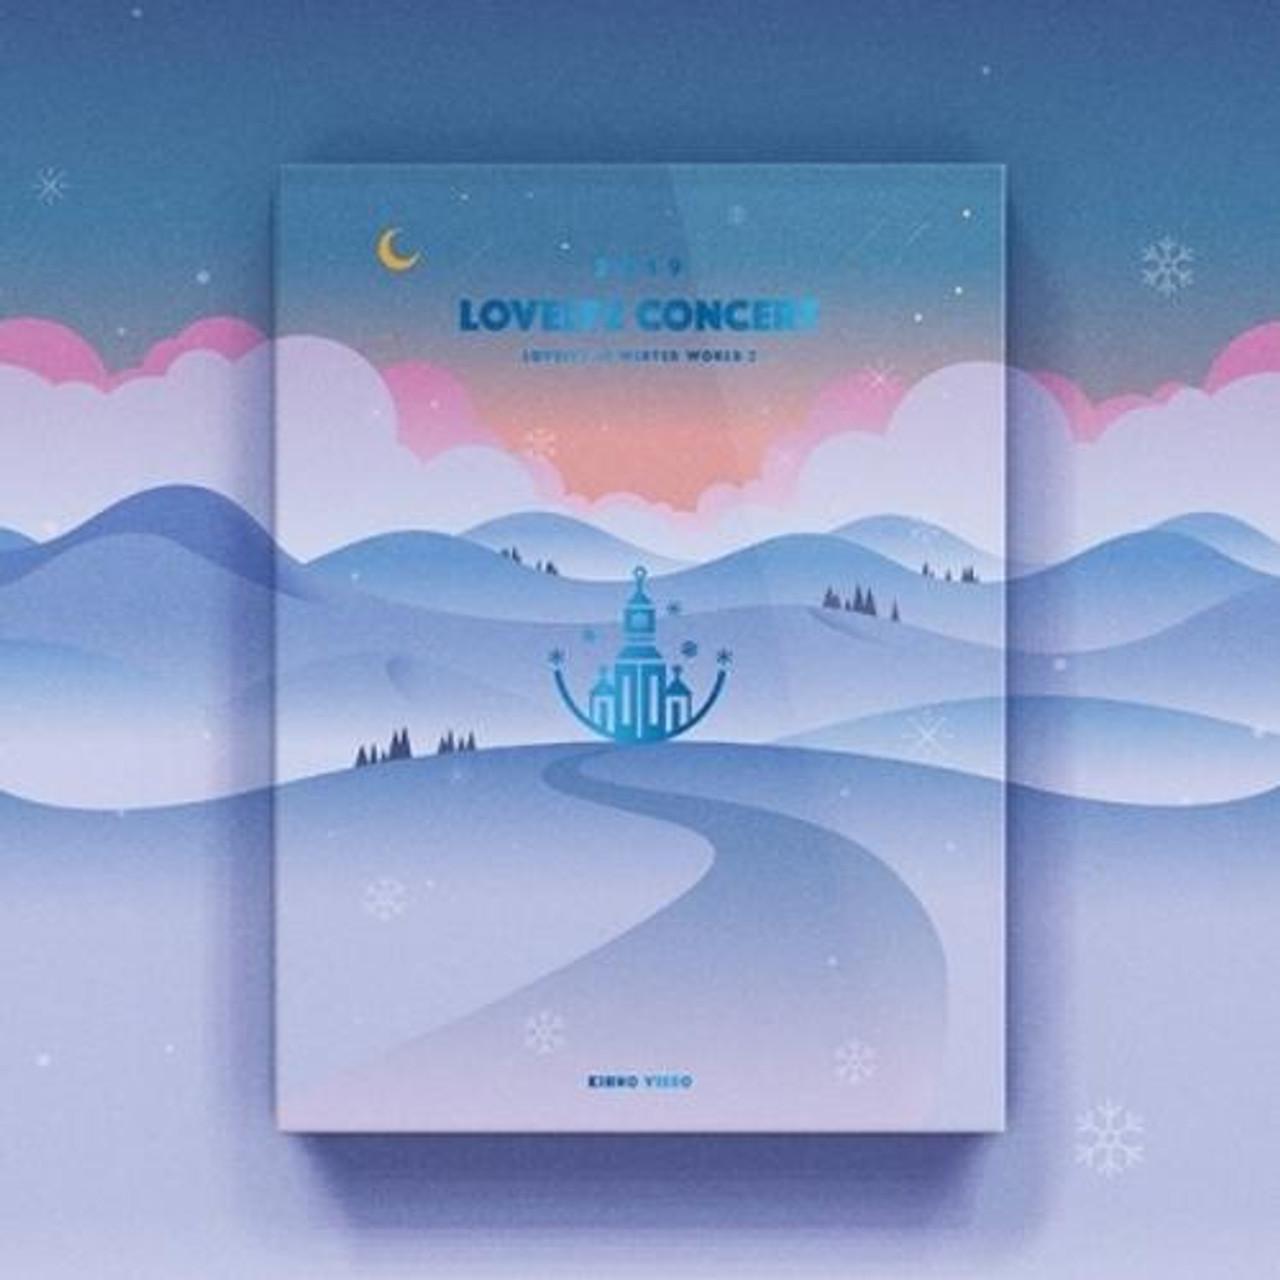 Lovelyz - 2019 LOVELYZ CONCERT [LOVELYZ IN WINTER WORLD 3] KIHNO VIDEO